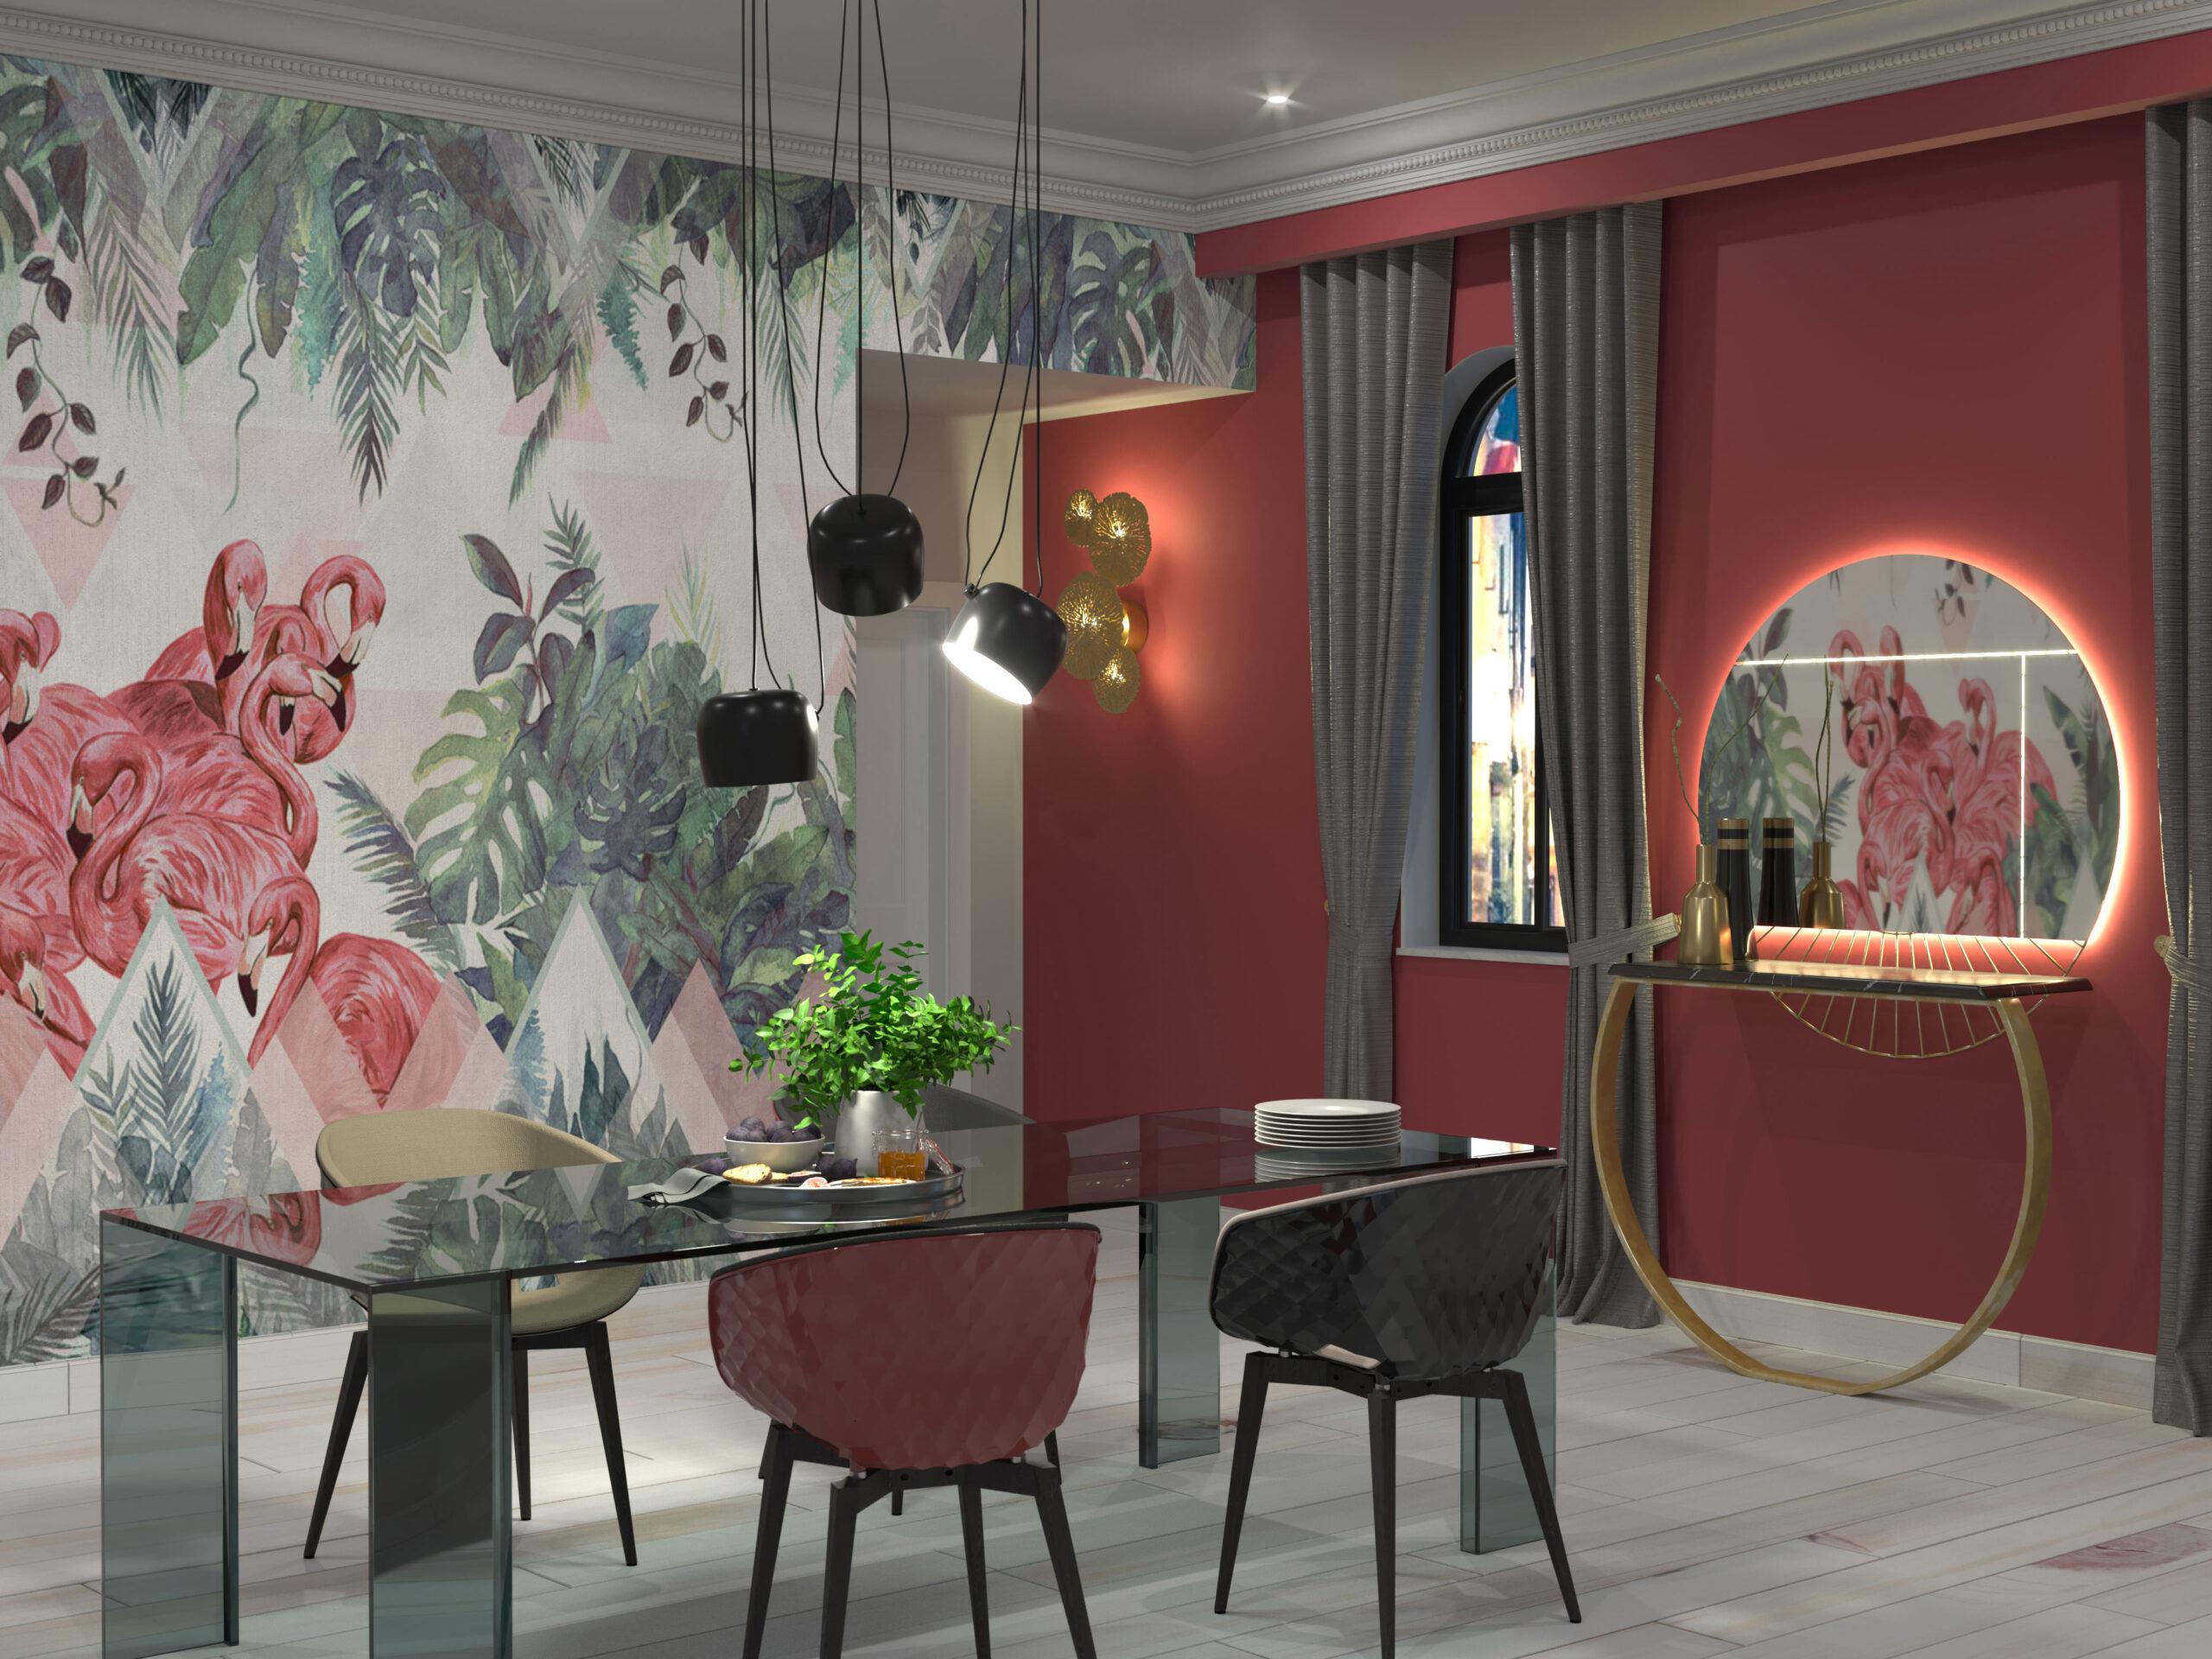 flamingo_dining_room_d107_1